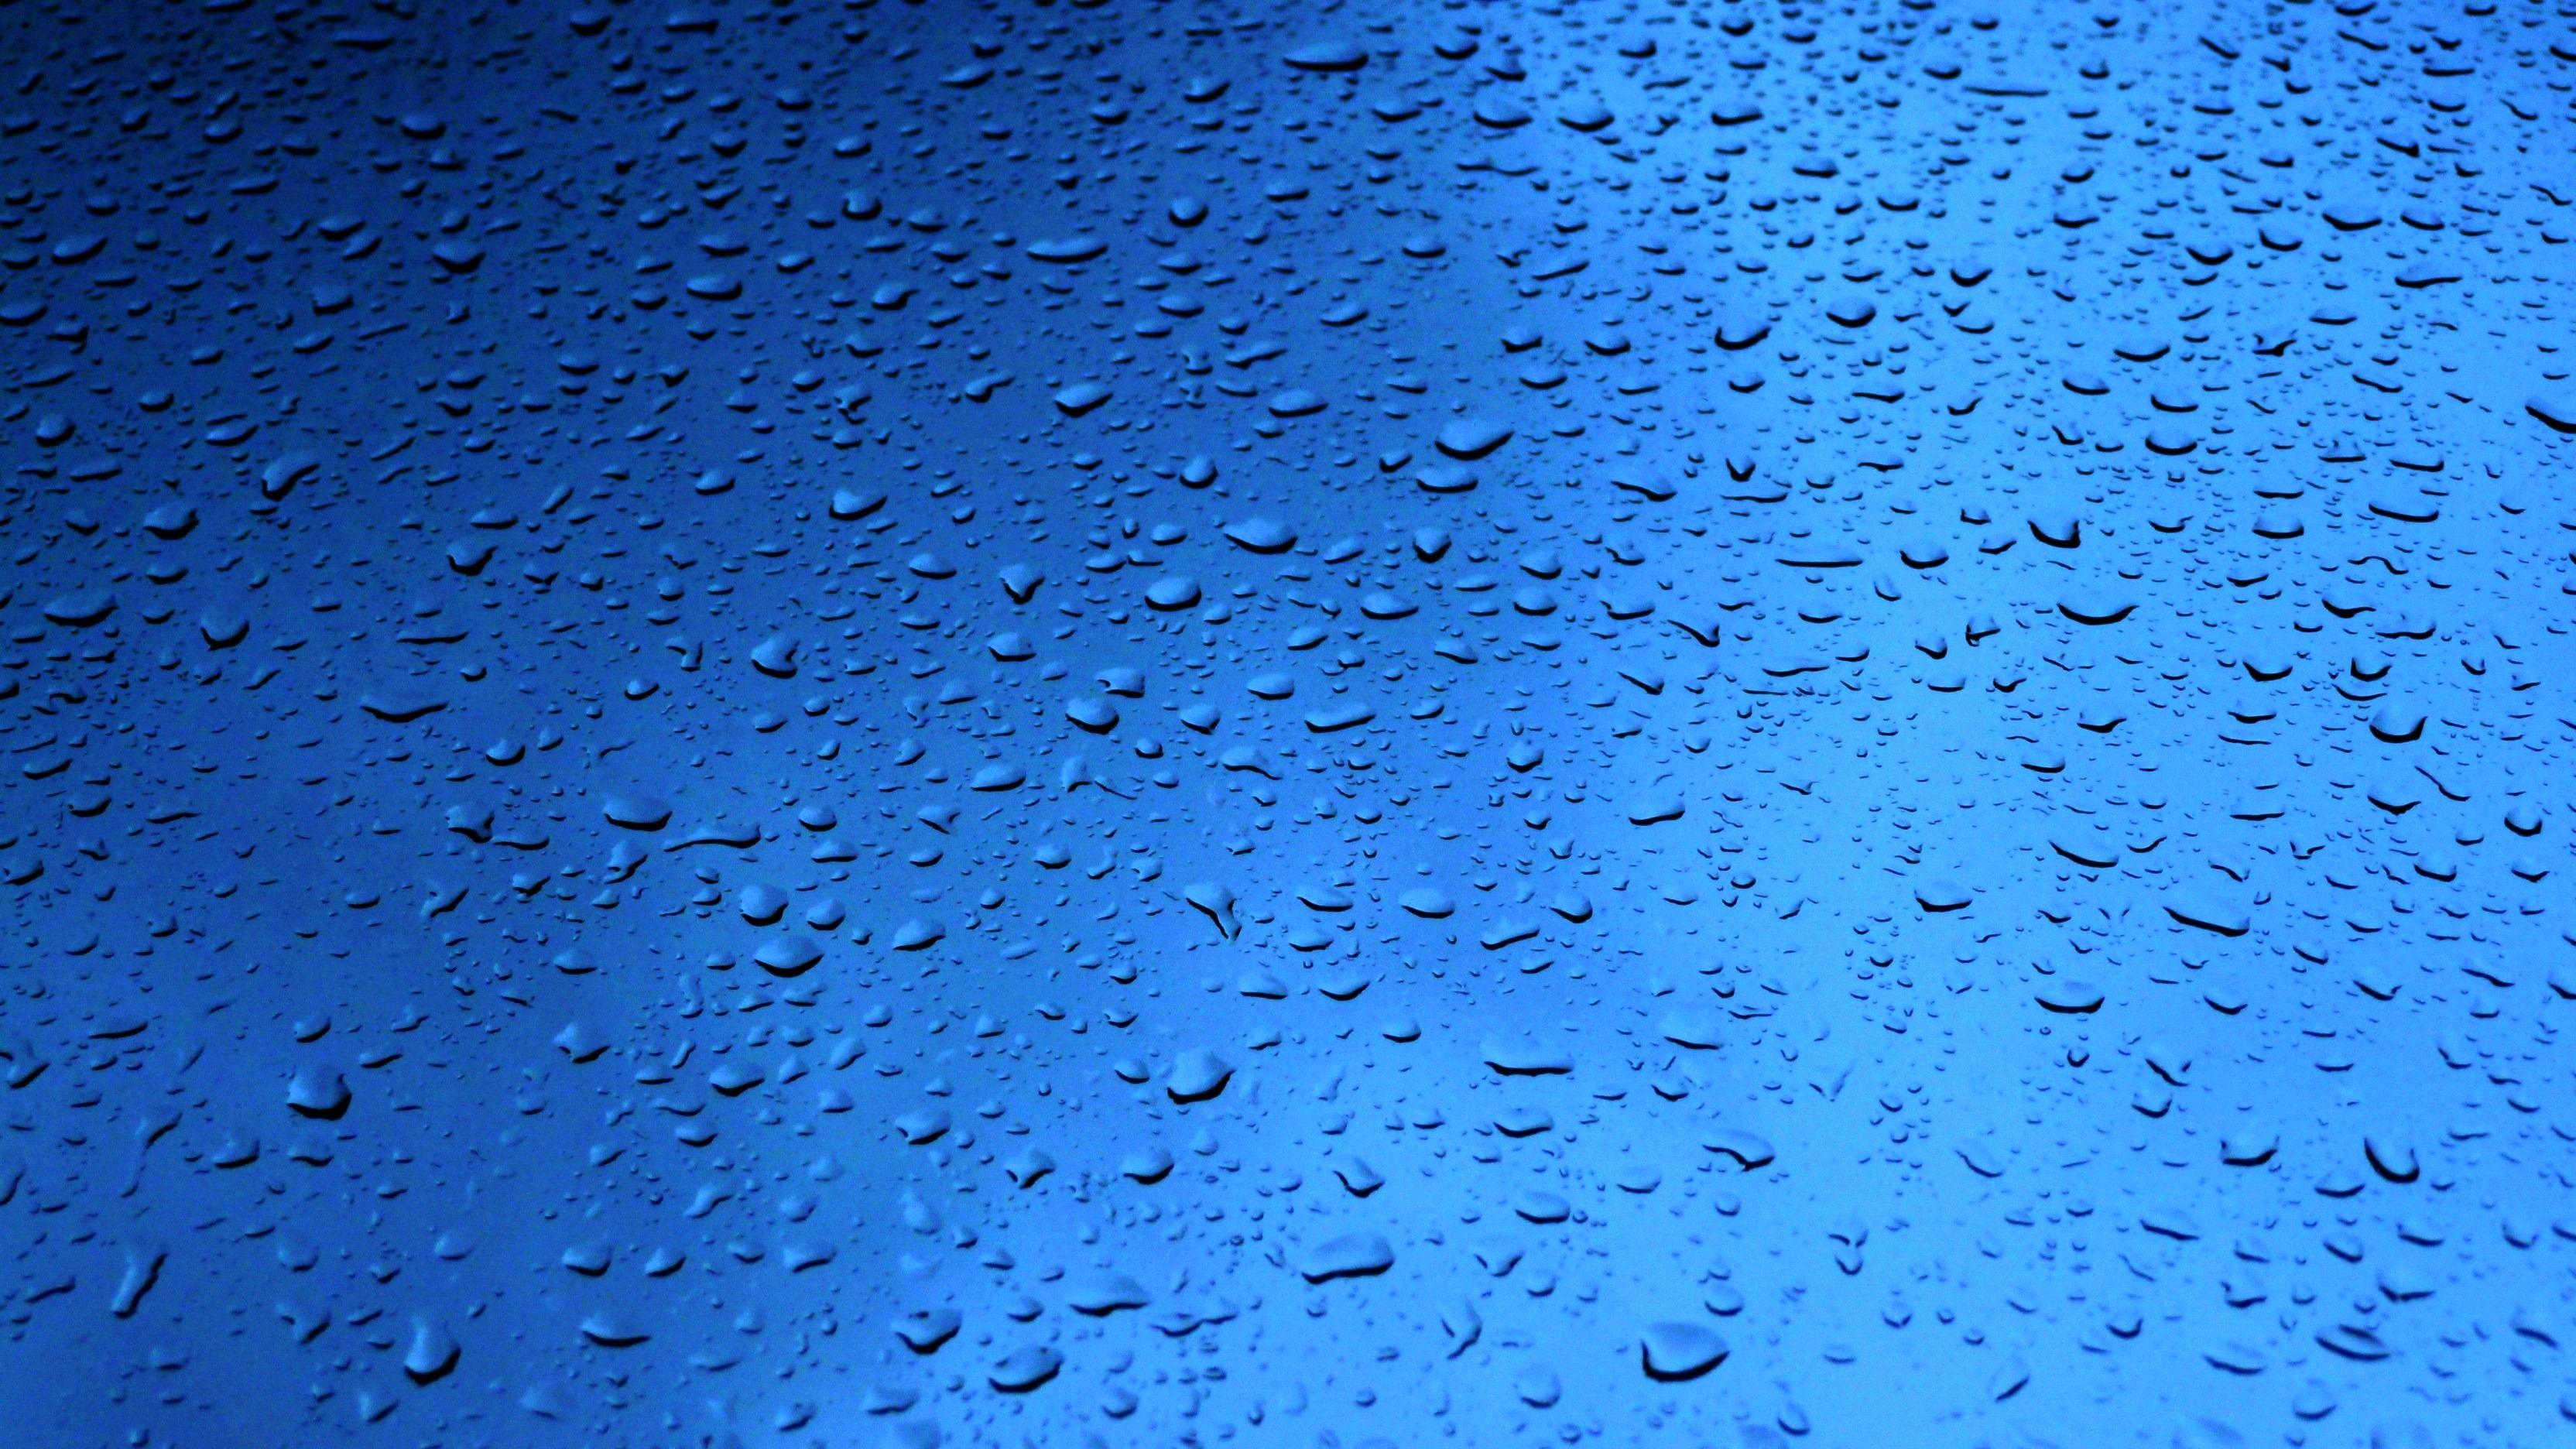 Gambar Dingin Penurunan Cair Tekstur Tetesan Air Jendela